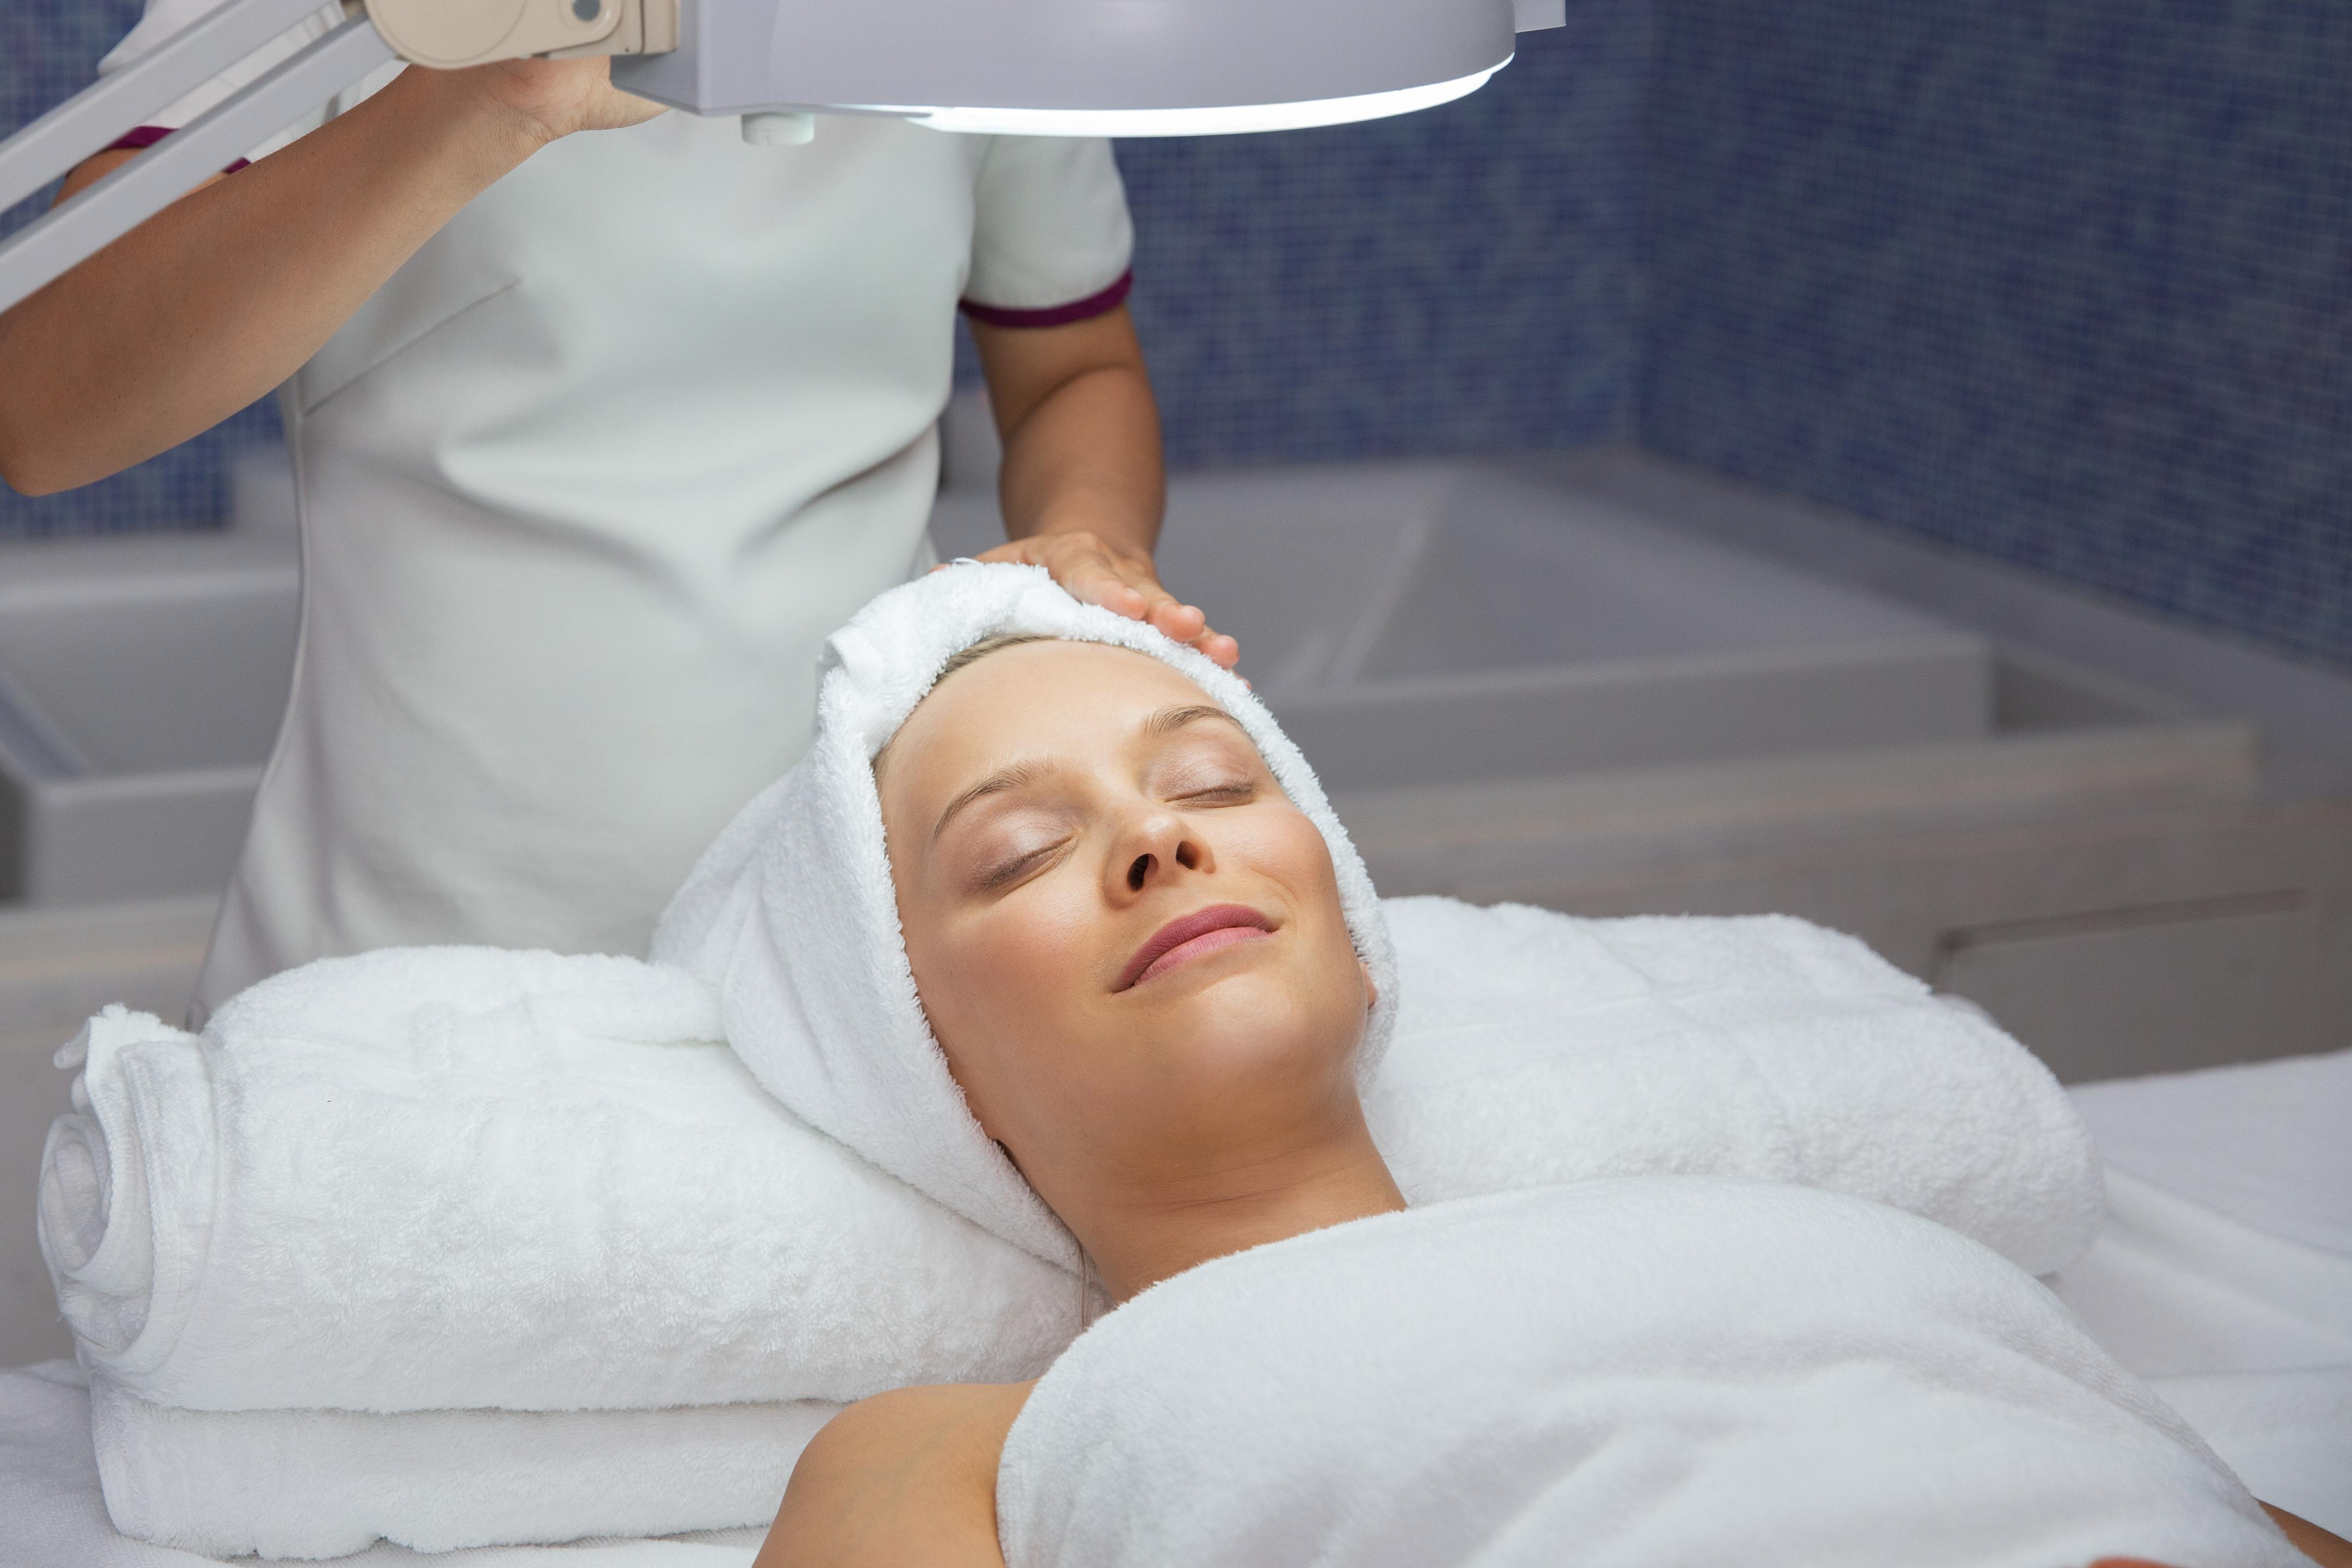 Magnifying Lamp for facial treatment - HeedSpa Miami Beach